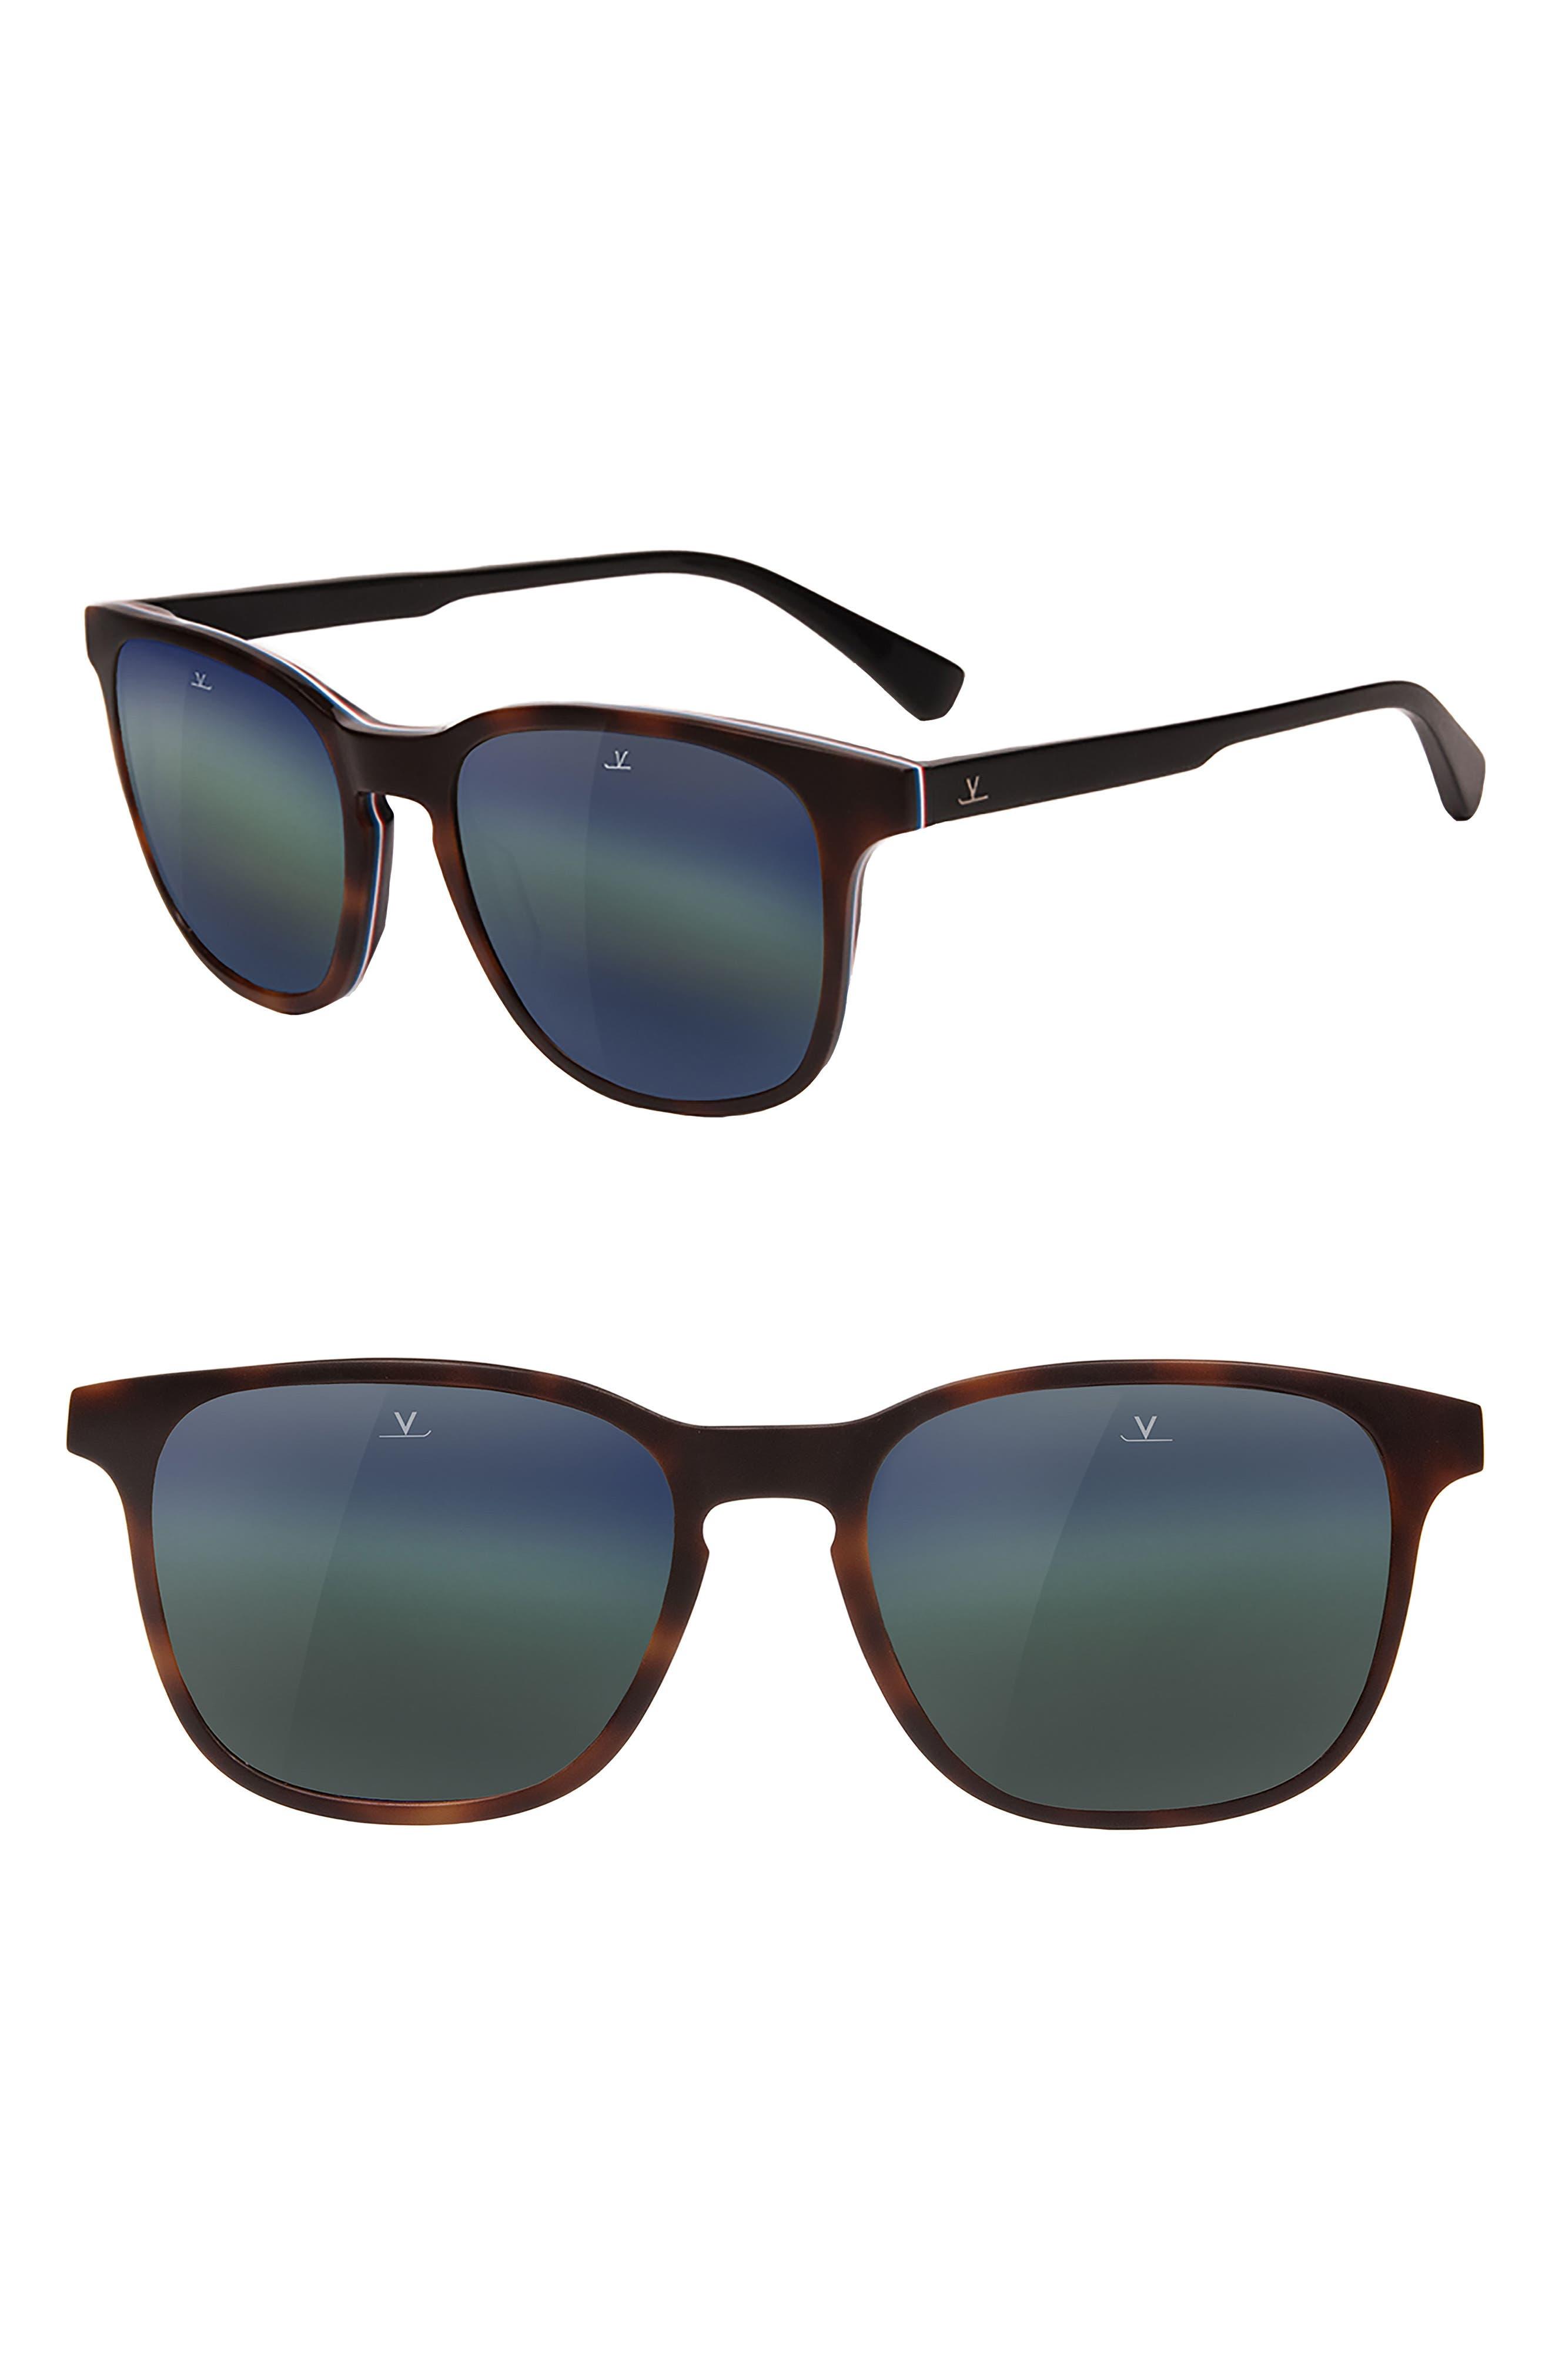 District Medium 53mm Sunglasses,                             Main thumbnail 1, color,                             Pure Grey Blue Lynx